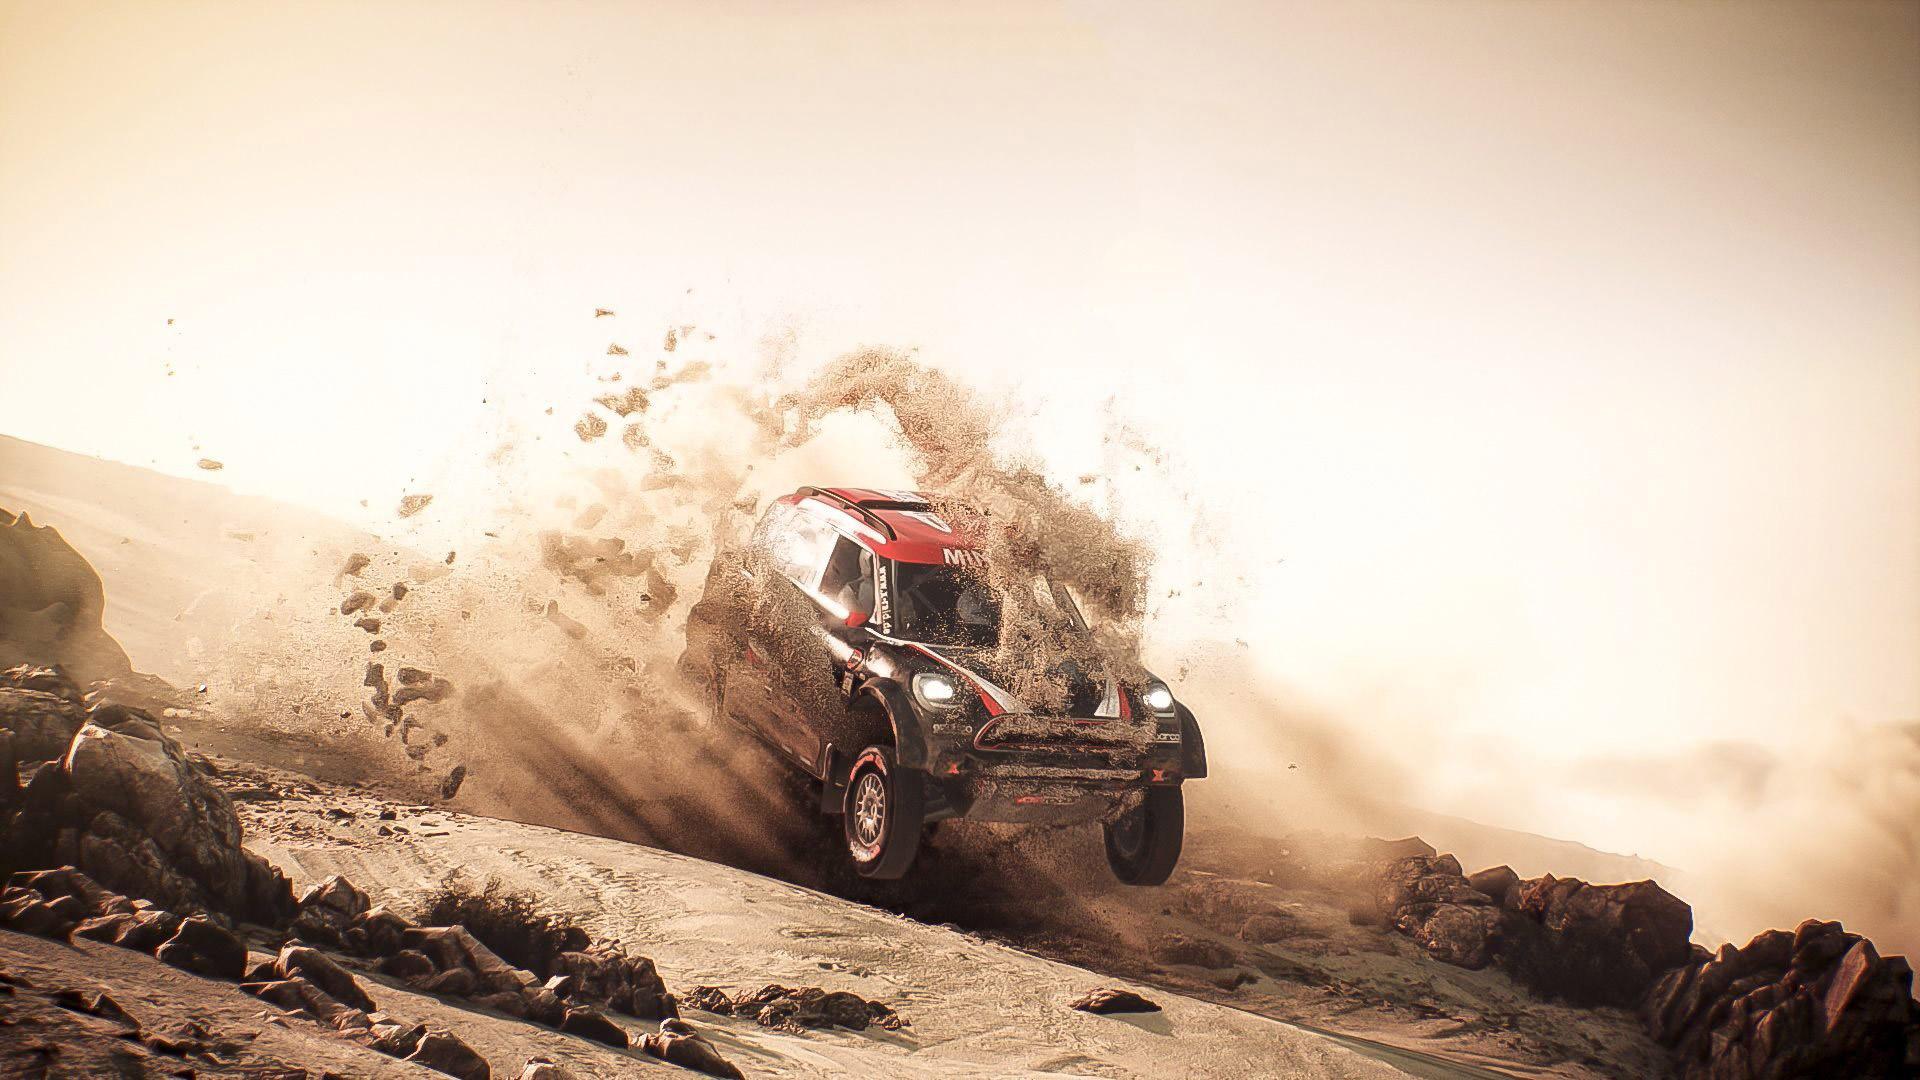 Free Dakar 18 Wallpaper in 1920x1080